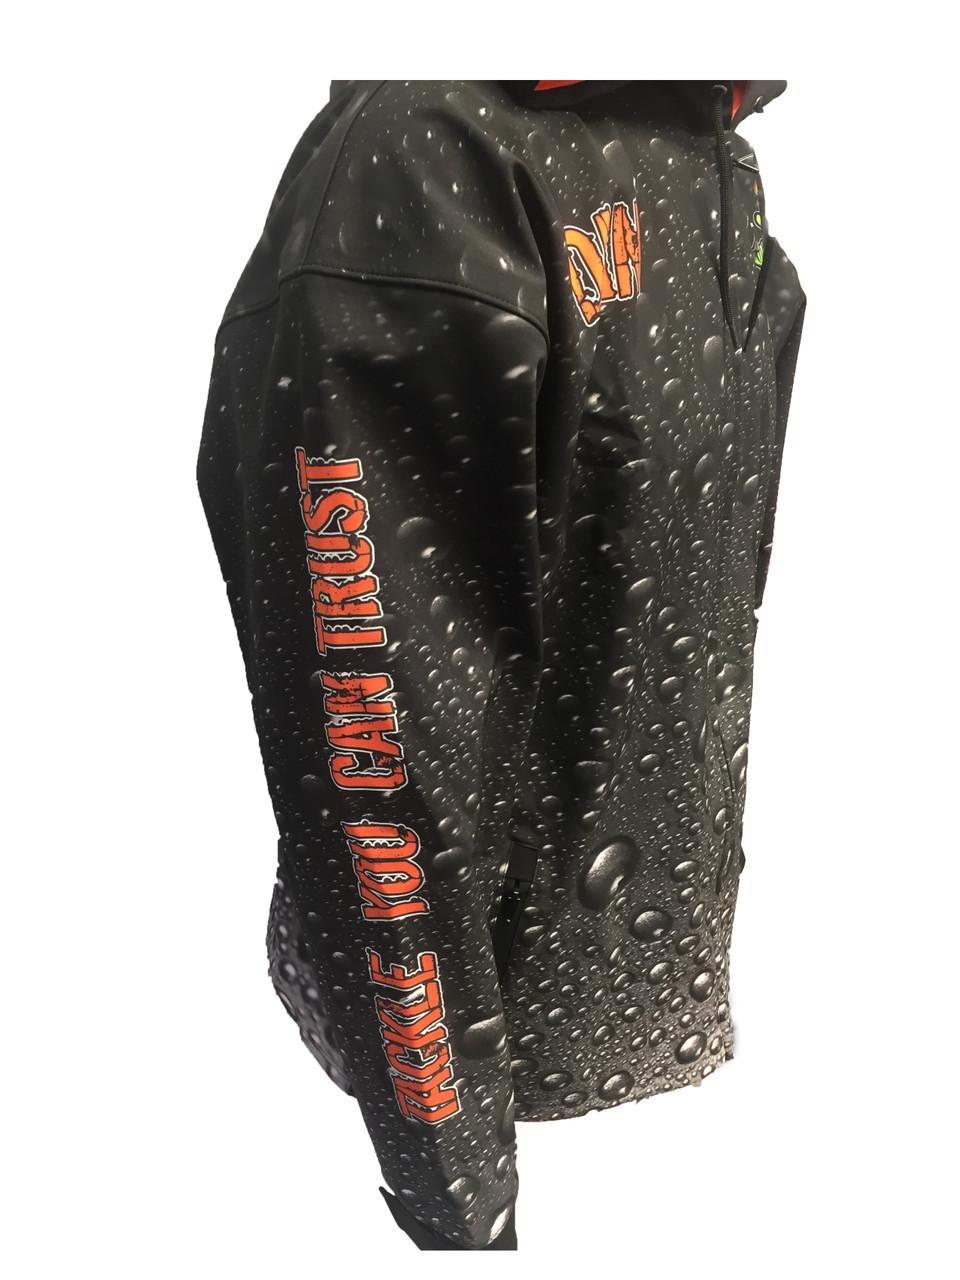 Rain Coat   Windproof and waterproof outer membrane Fleece-backed inner layer for warmth Add waterproof zipper & seam sealing for full weatherproofing A versatile outerwear piece